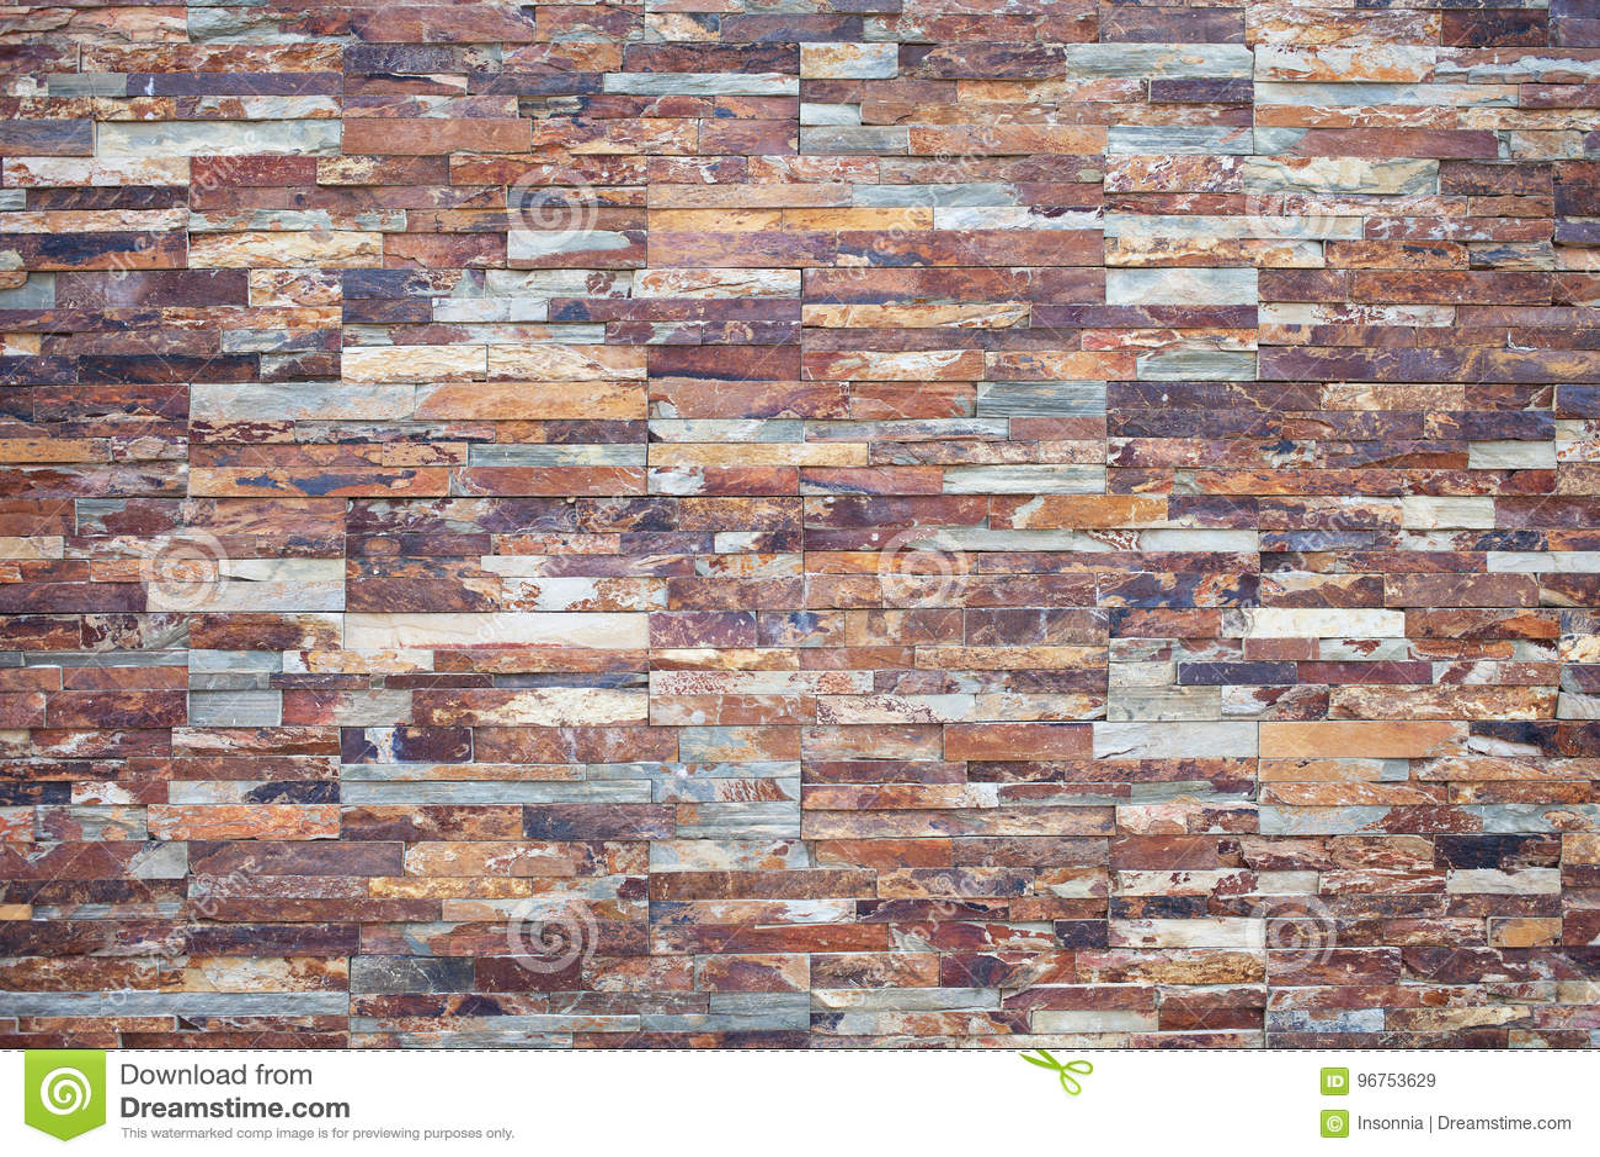 Rusty Stone Stone Veneer For Exterior Wall Decor Stock